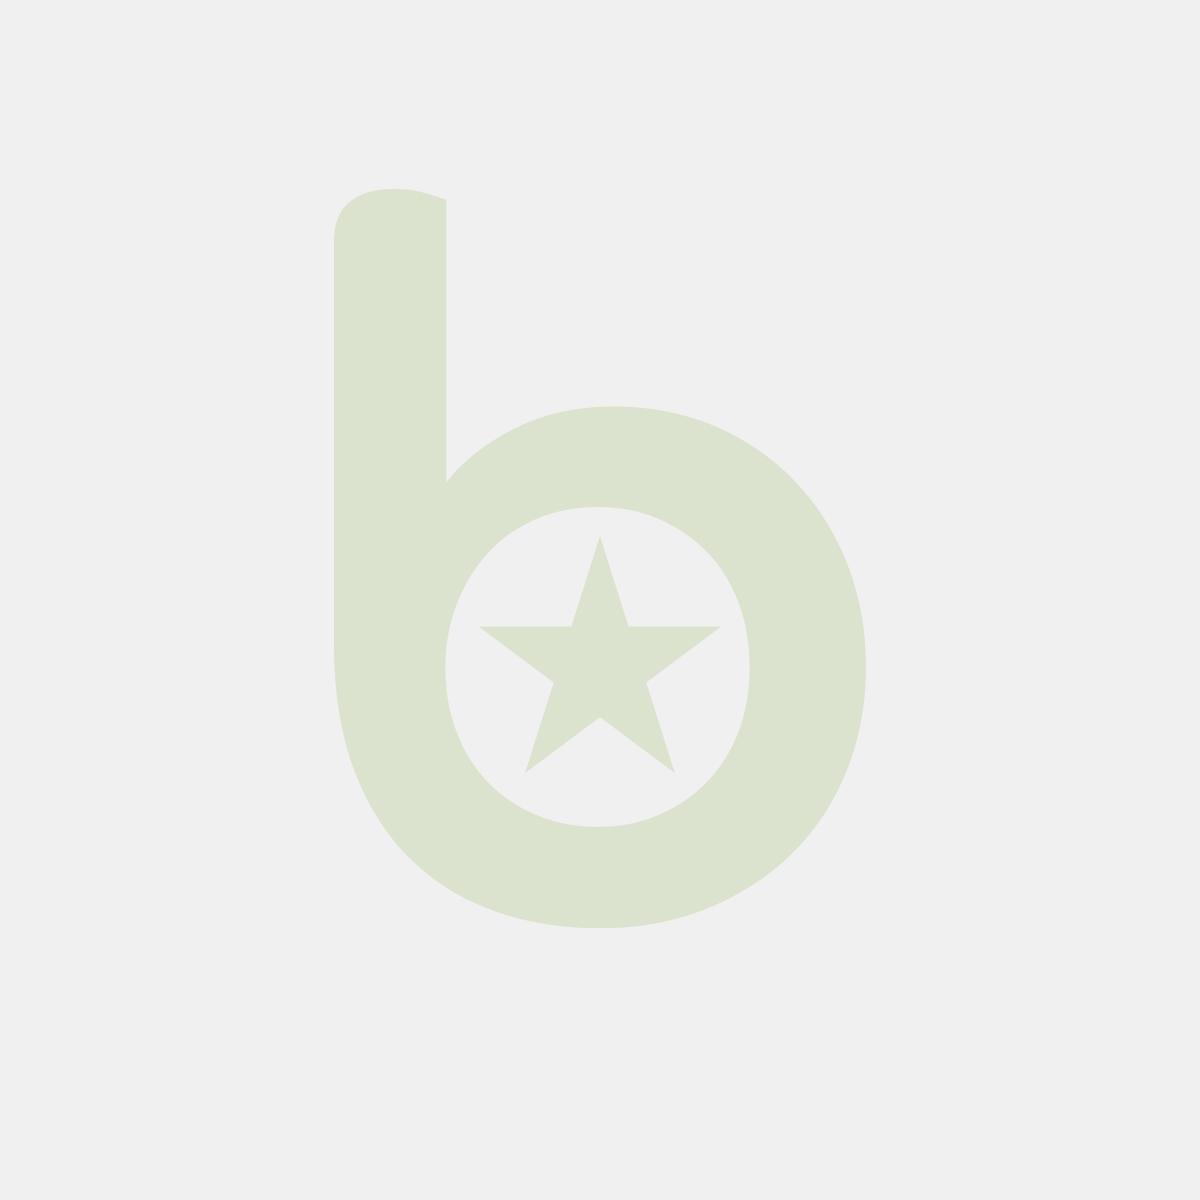 Skrobka prostokątna - kod 554364